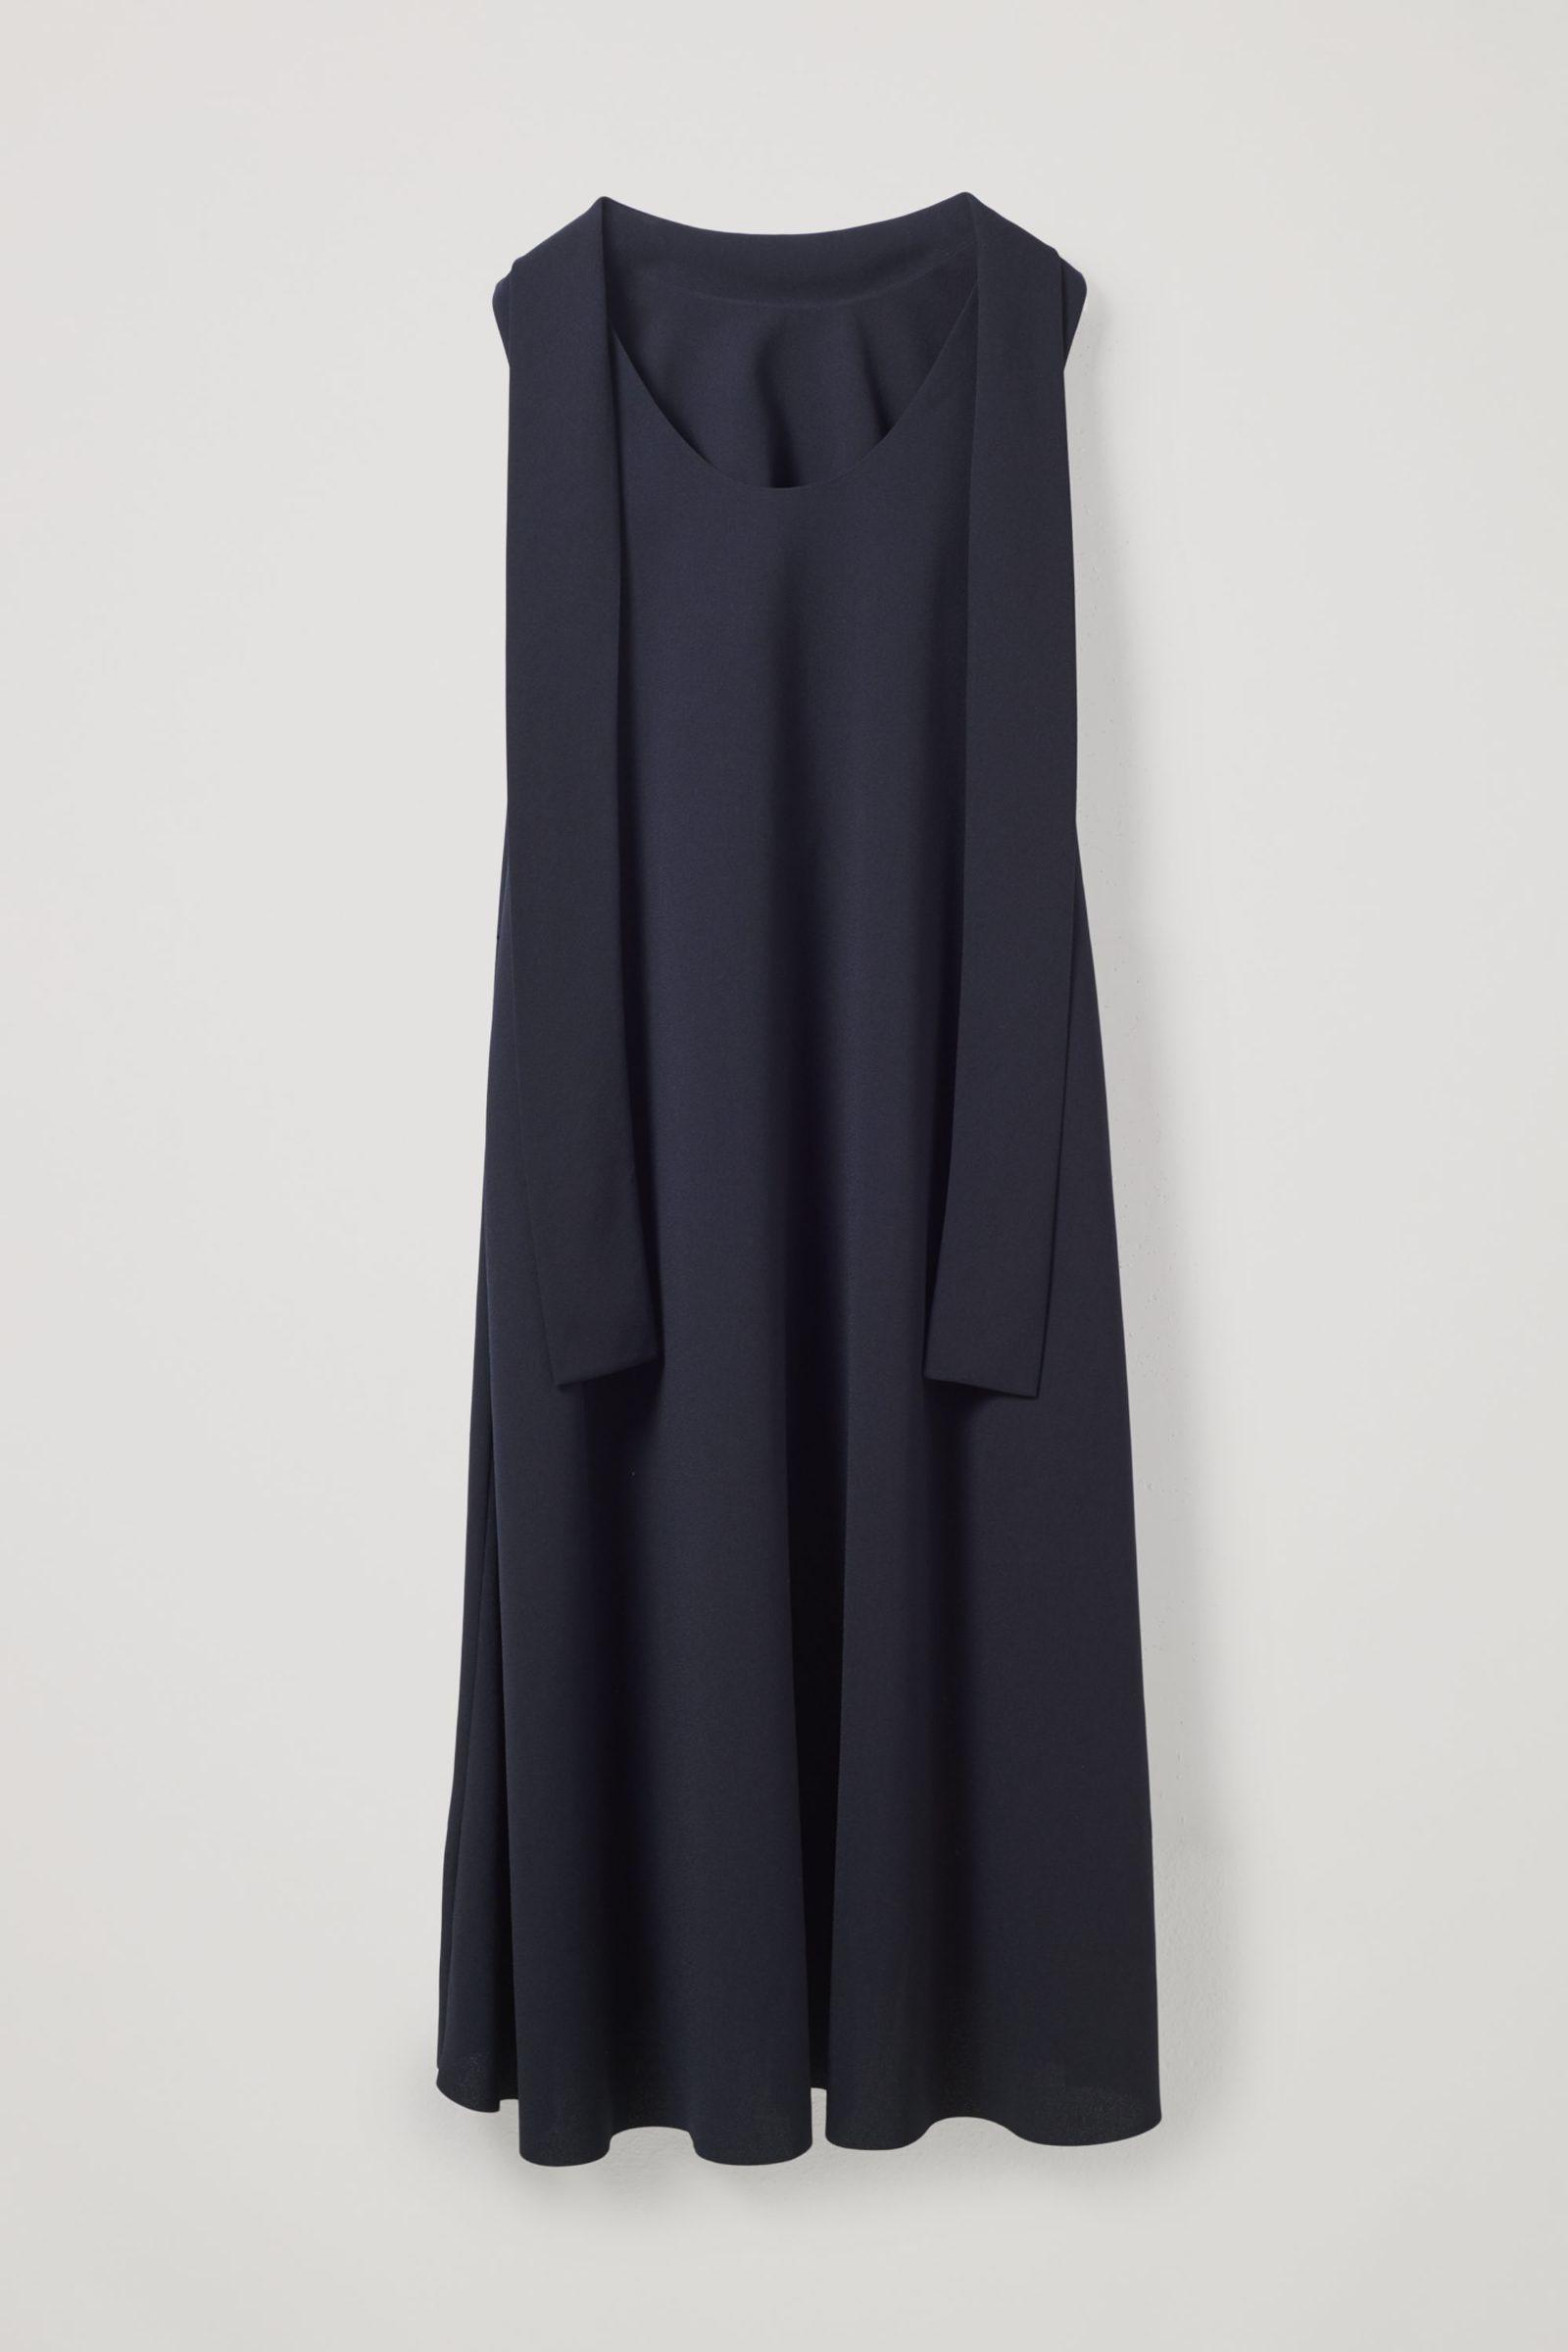 COS 하이 칼라 미디 드레스의 네이비컬러 Product입니다.